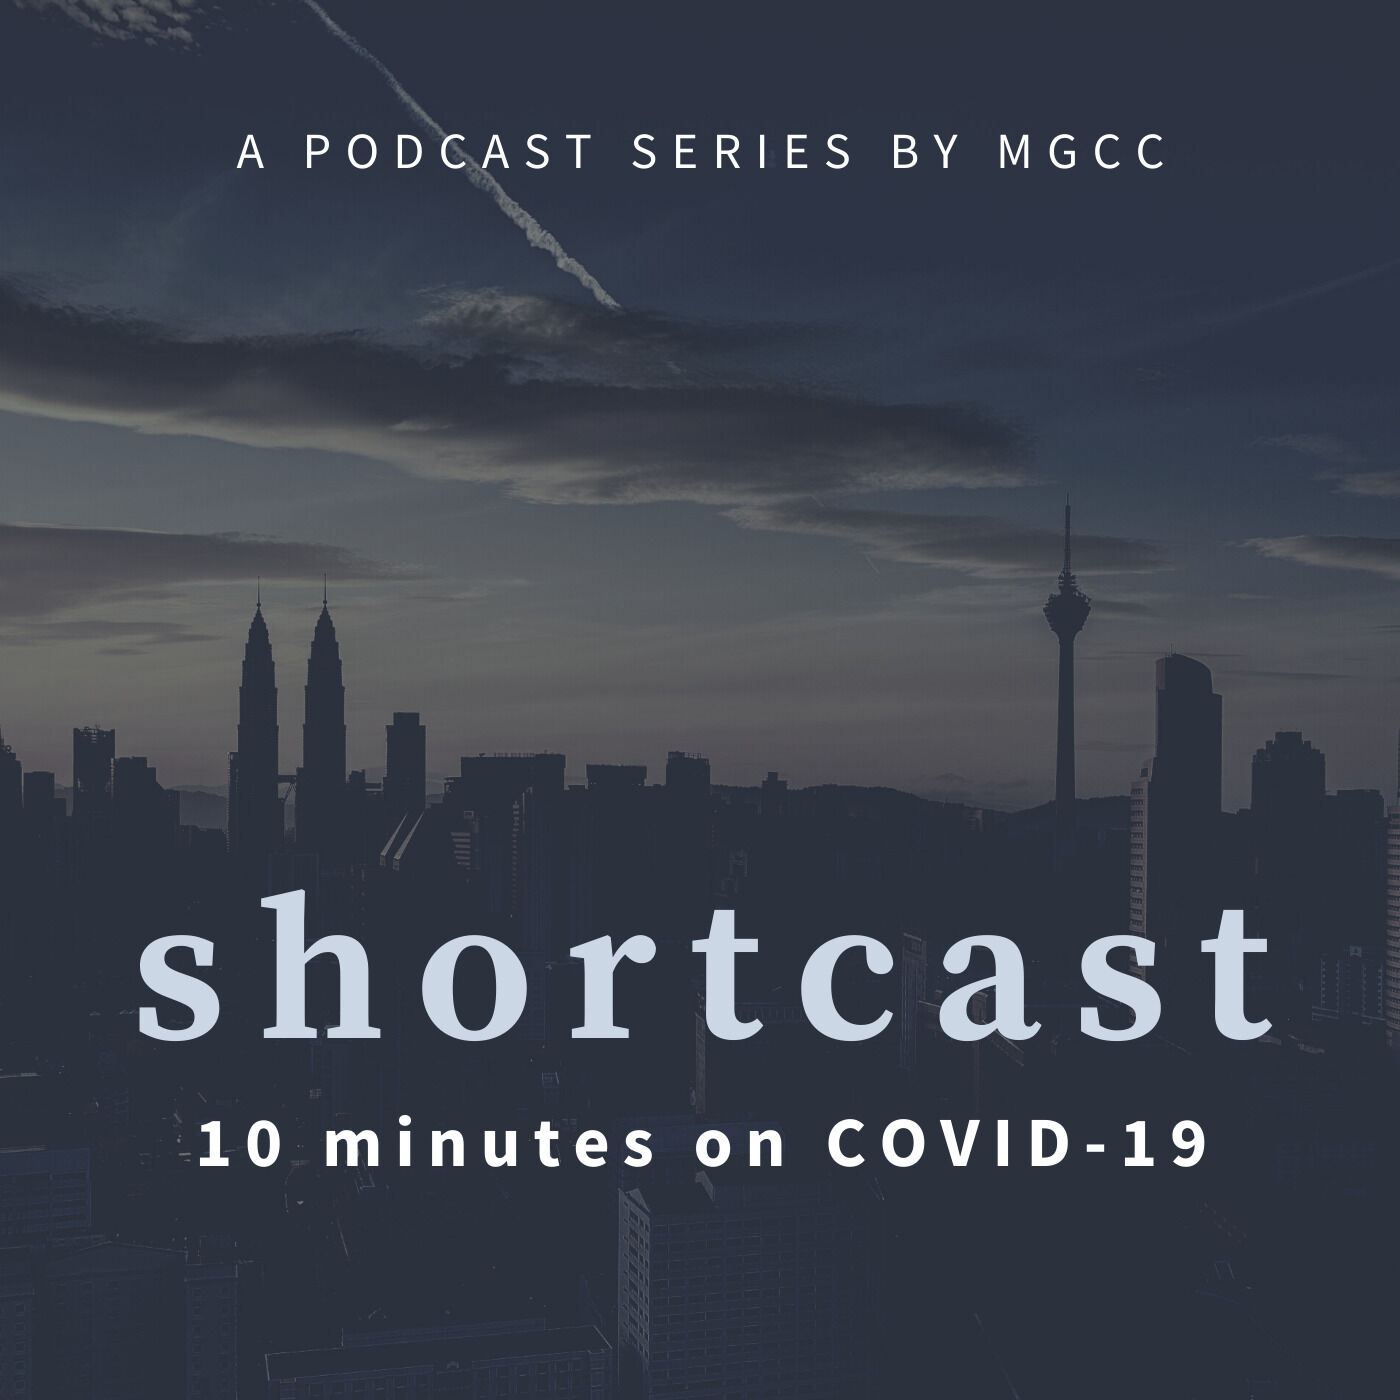 Shortcast #013: David Jones (Chartered Management Institute (CMI) & EUMCCI)